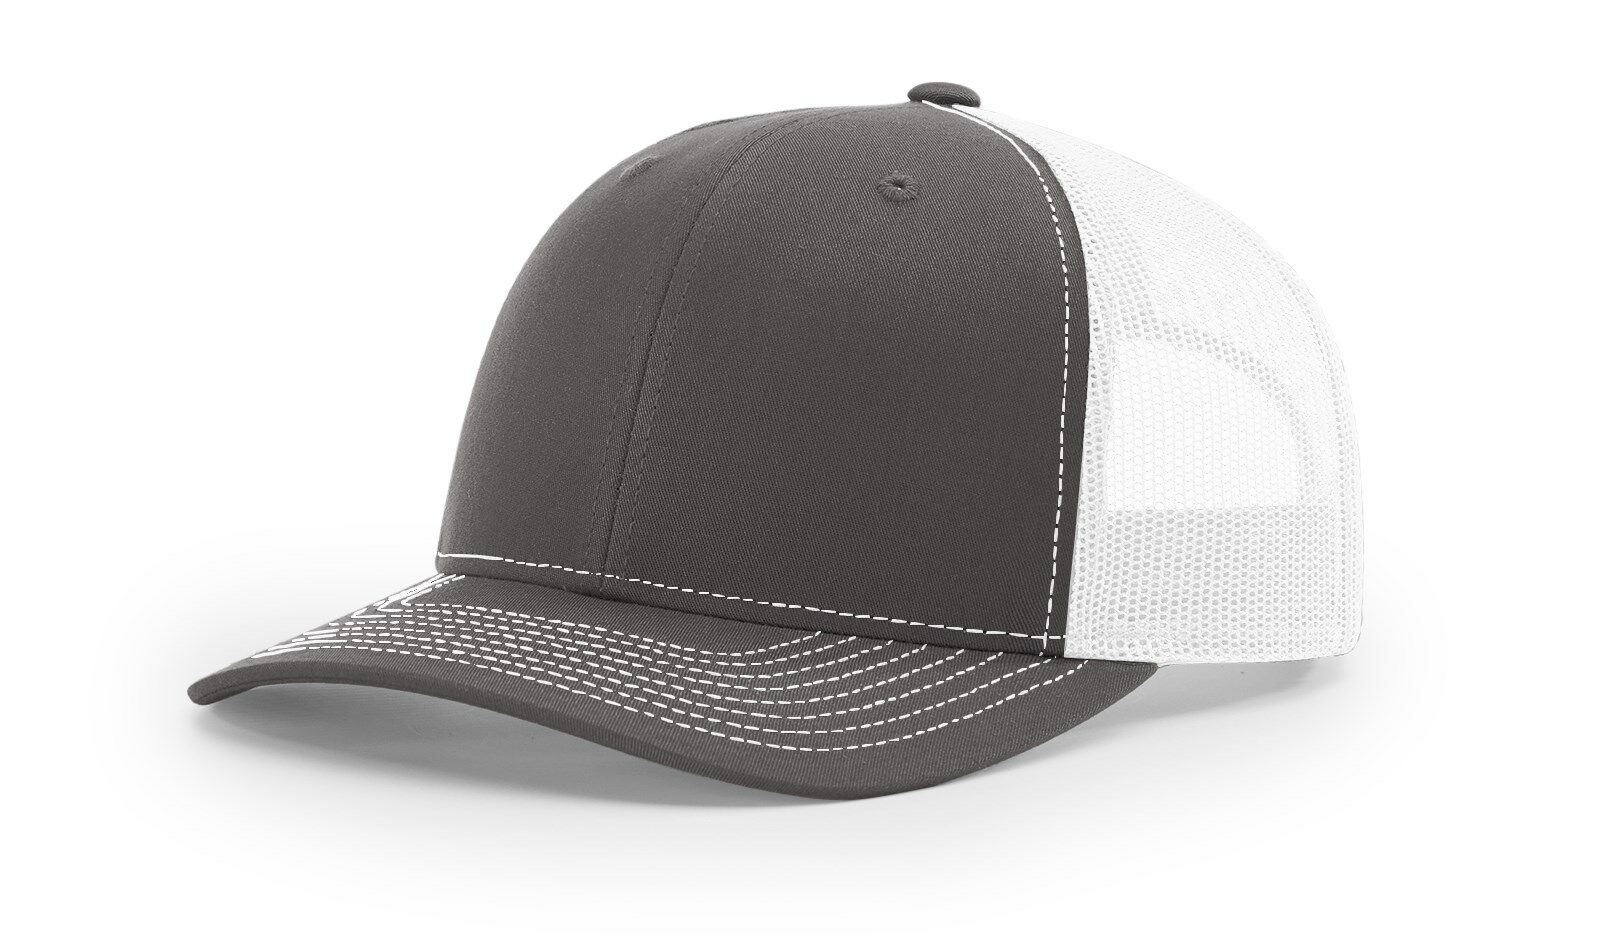 009581249d6a5 112 Richardson Trucker Ball Cap Mesh Hat Adjustable Snapback